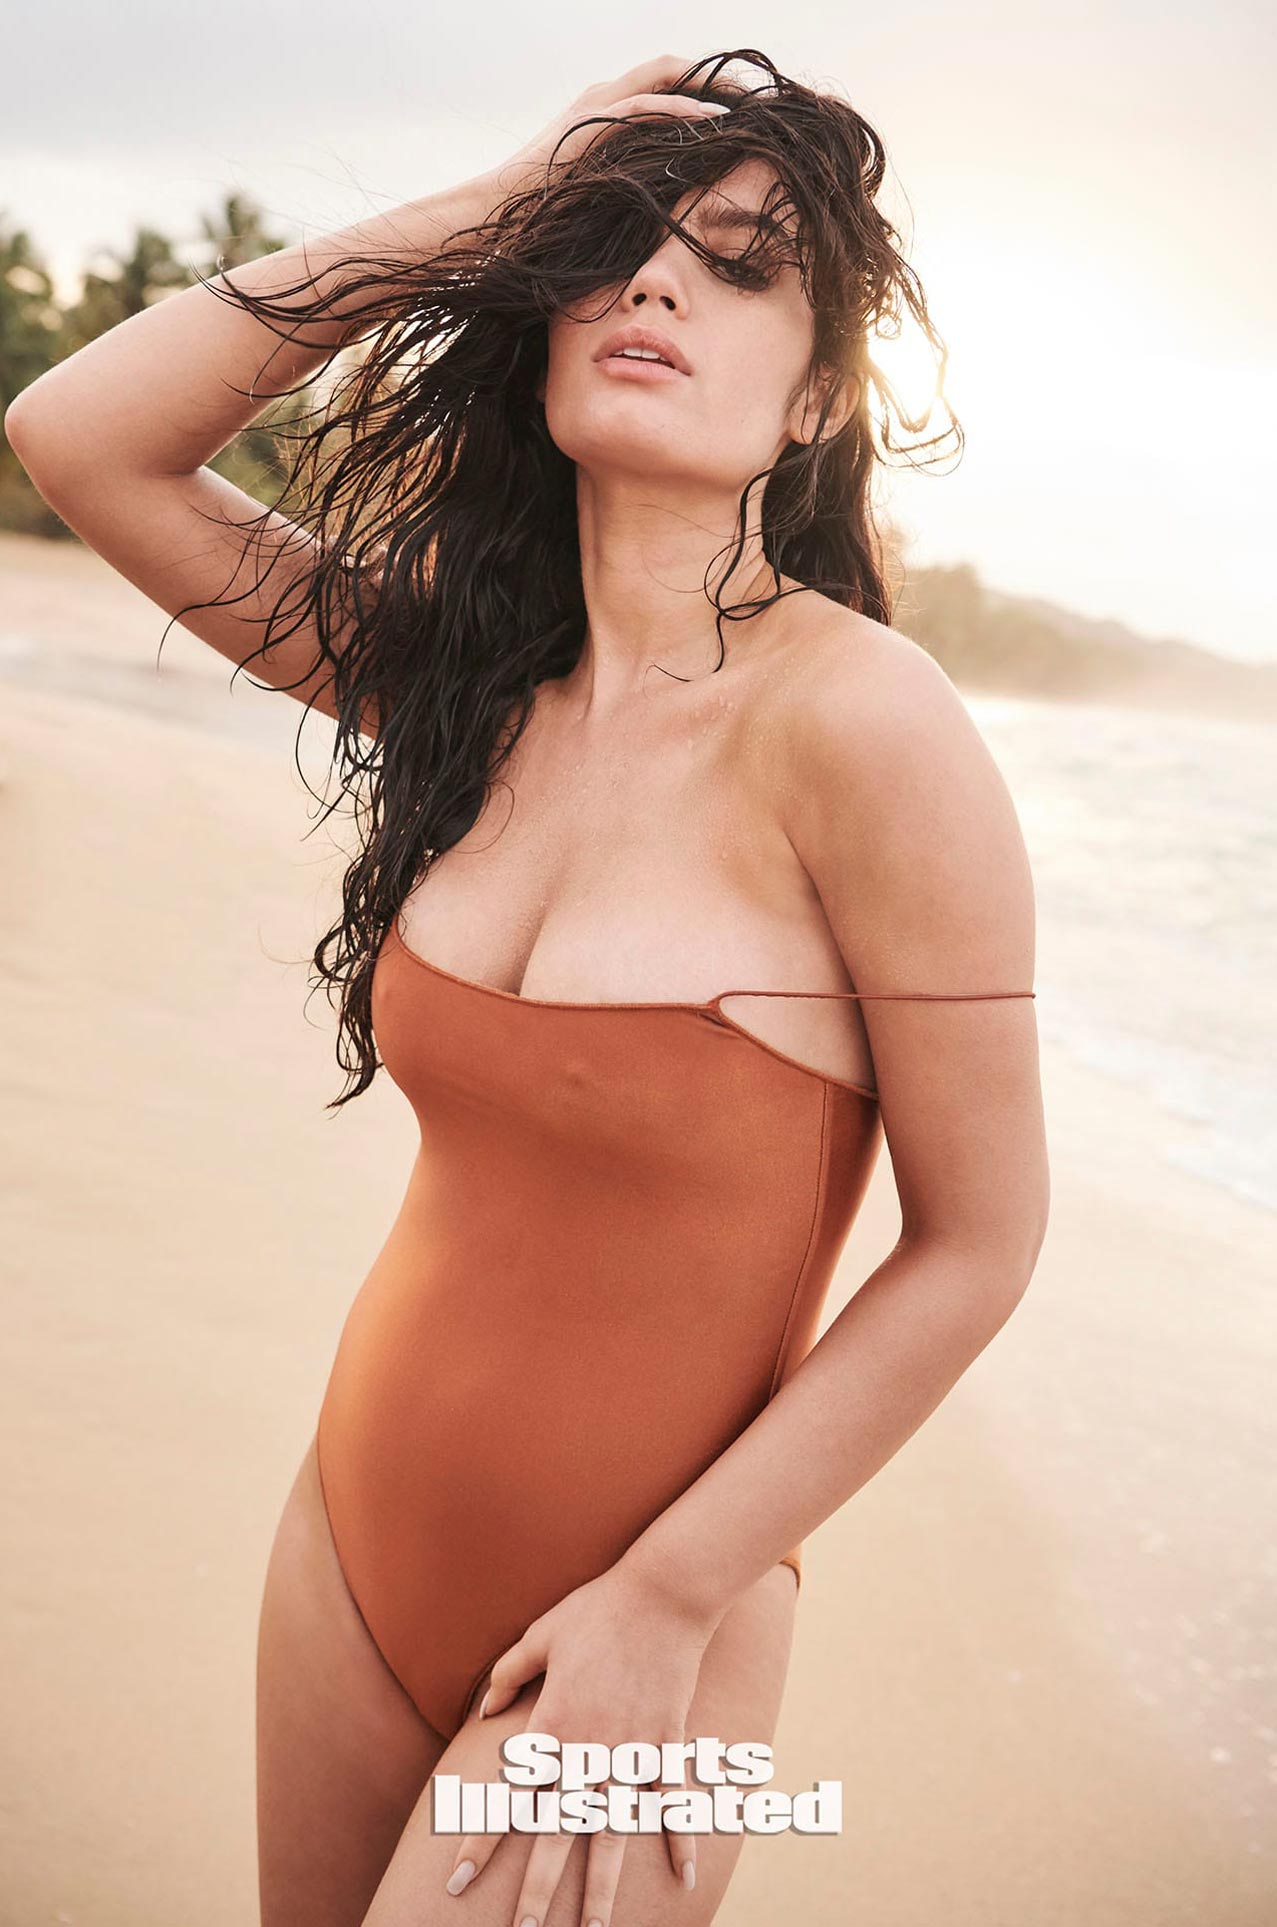 Энн де Паула в каталоге купальников Sports Illustrated Swimsuit 2020 / фото 23